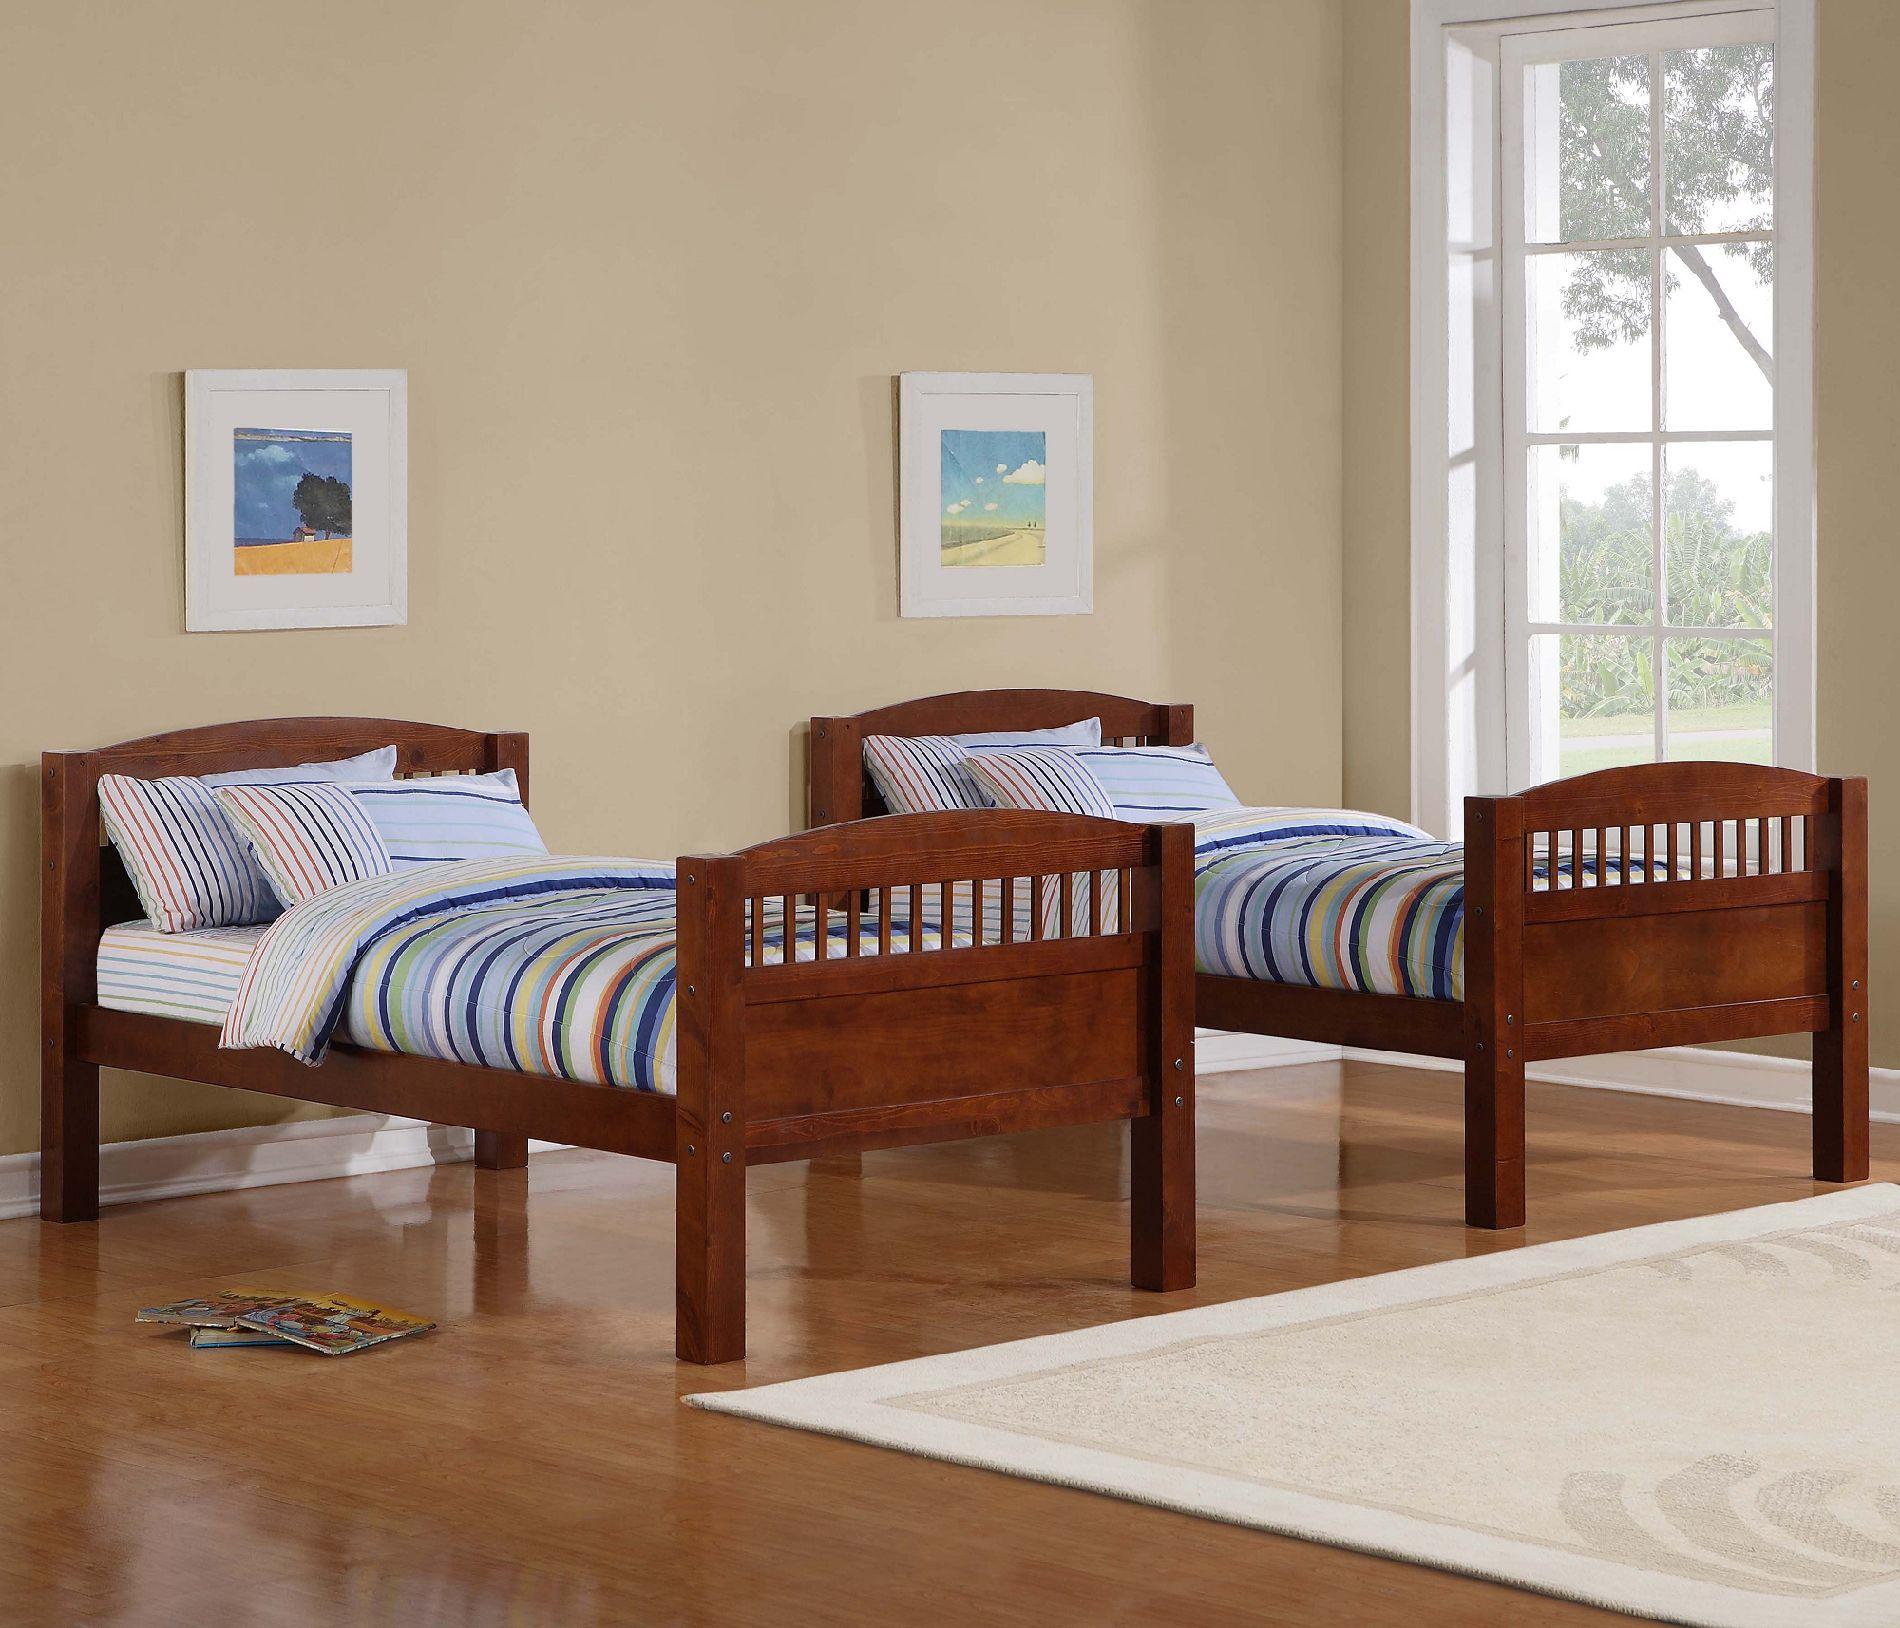 Dorel Home Furnishings Bunk Bed Walnut